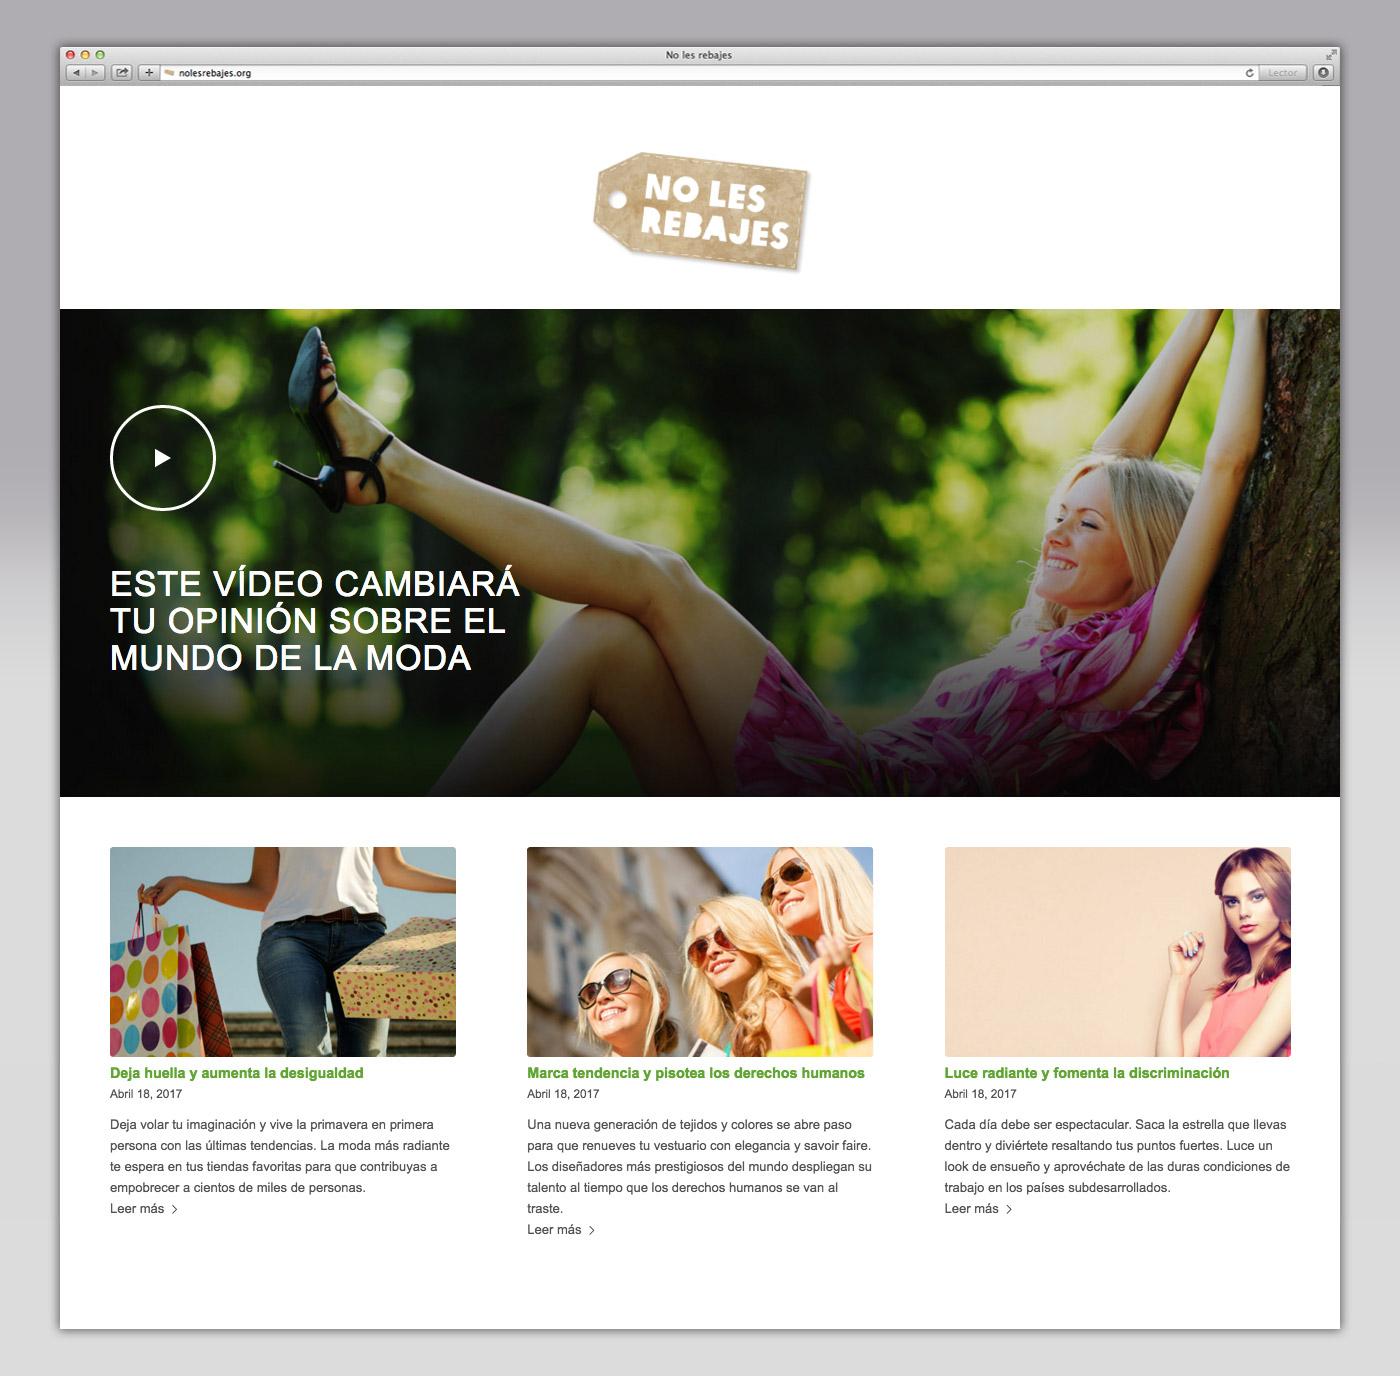 Oxfam-Intermon-Web-No-Les-Rebajes-1